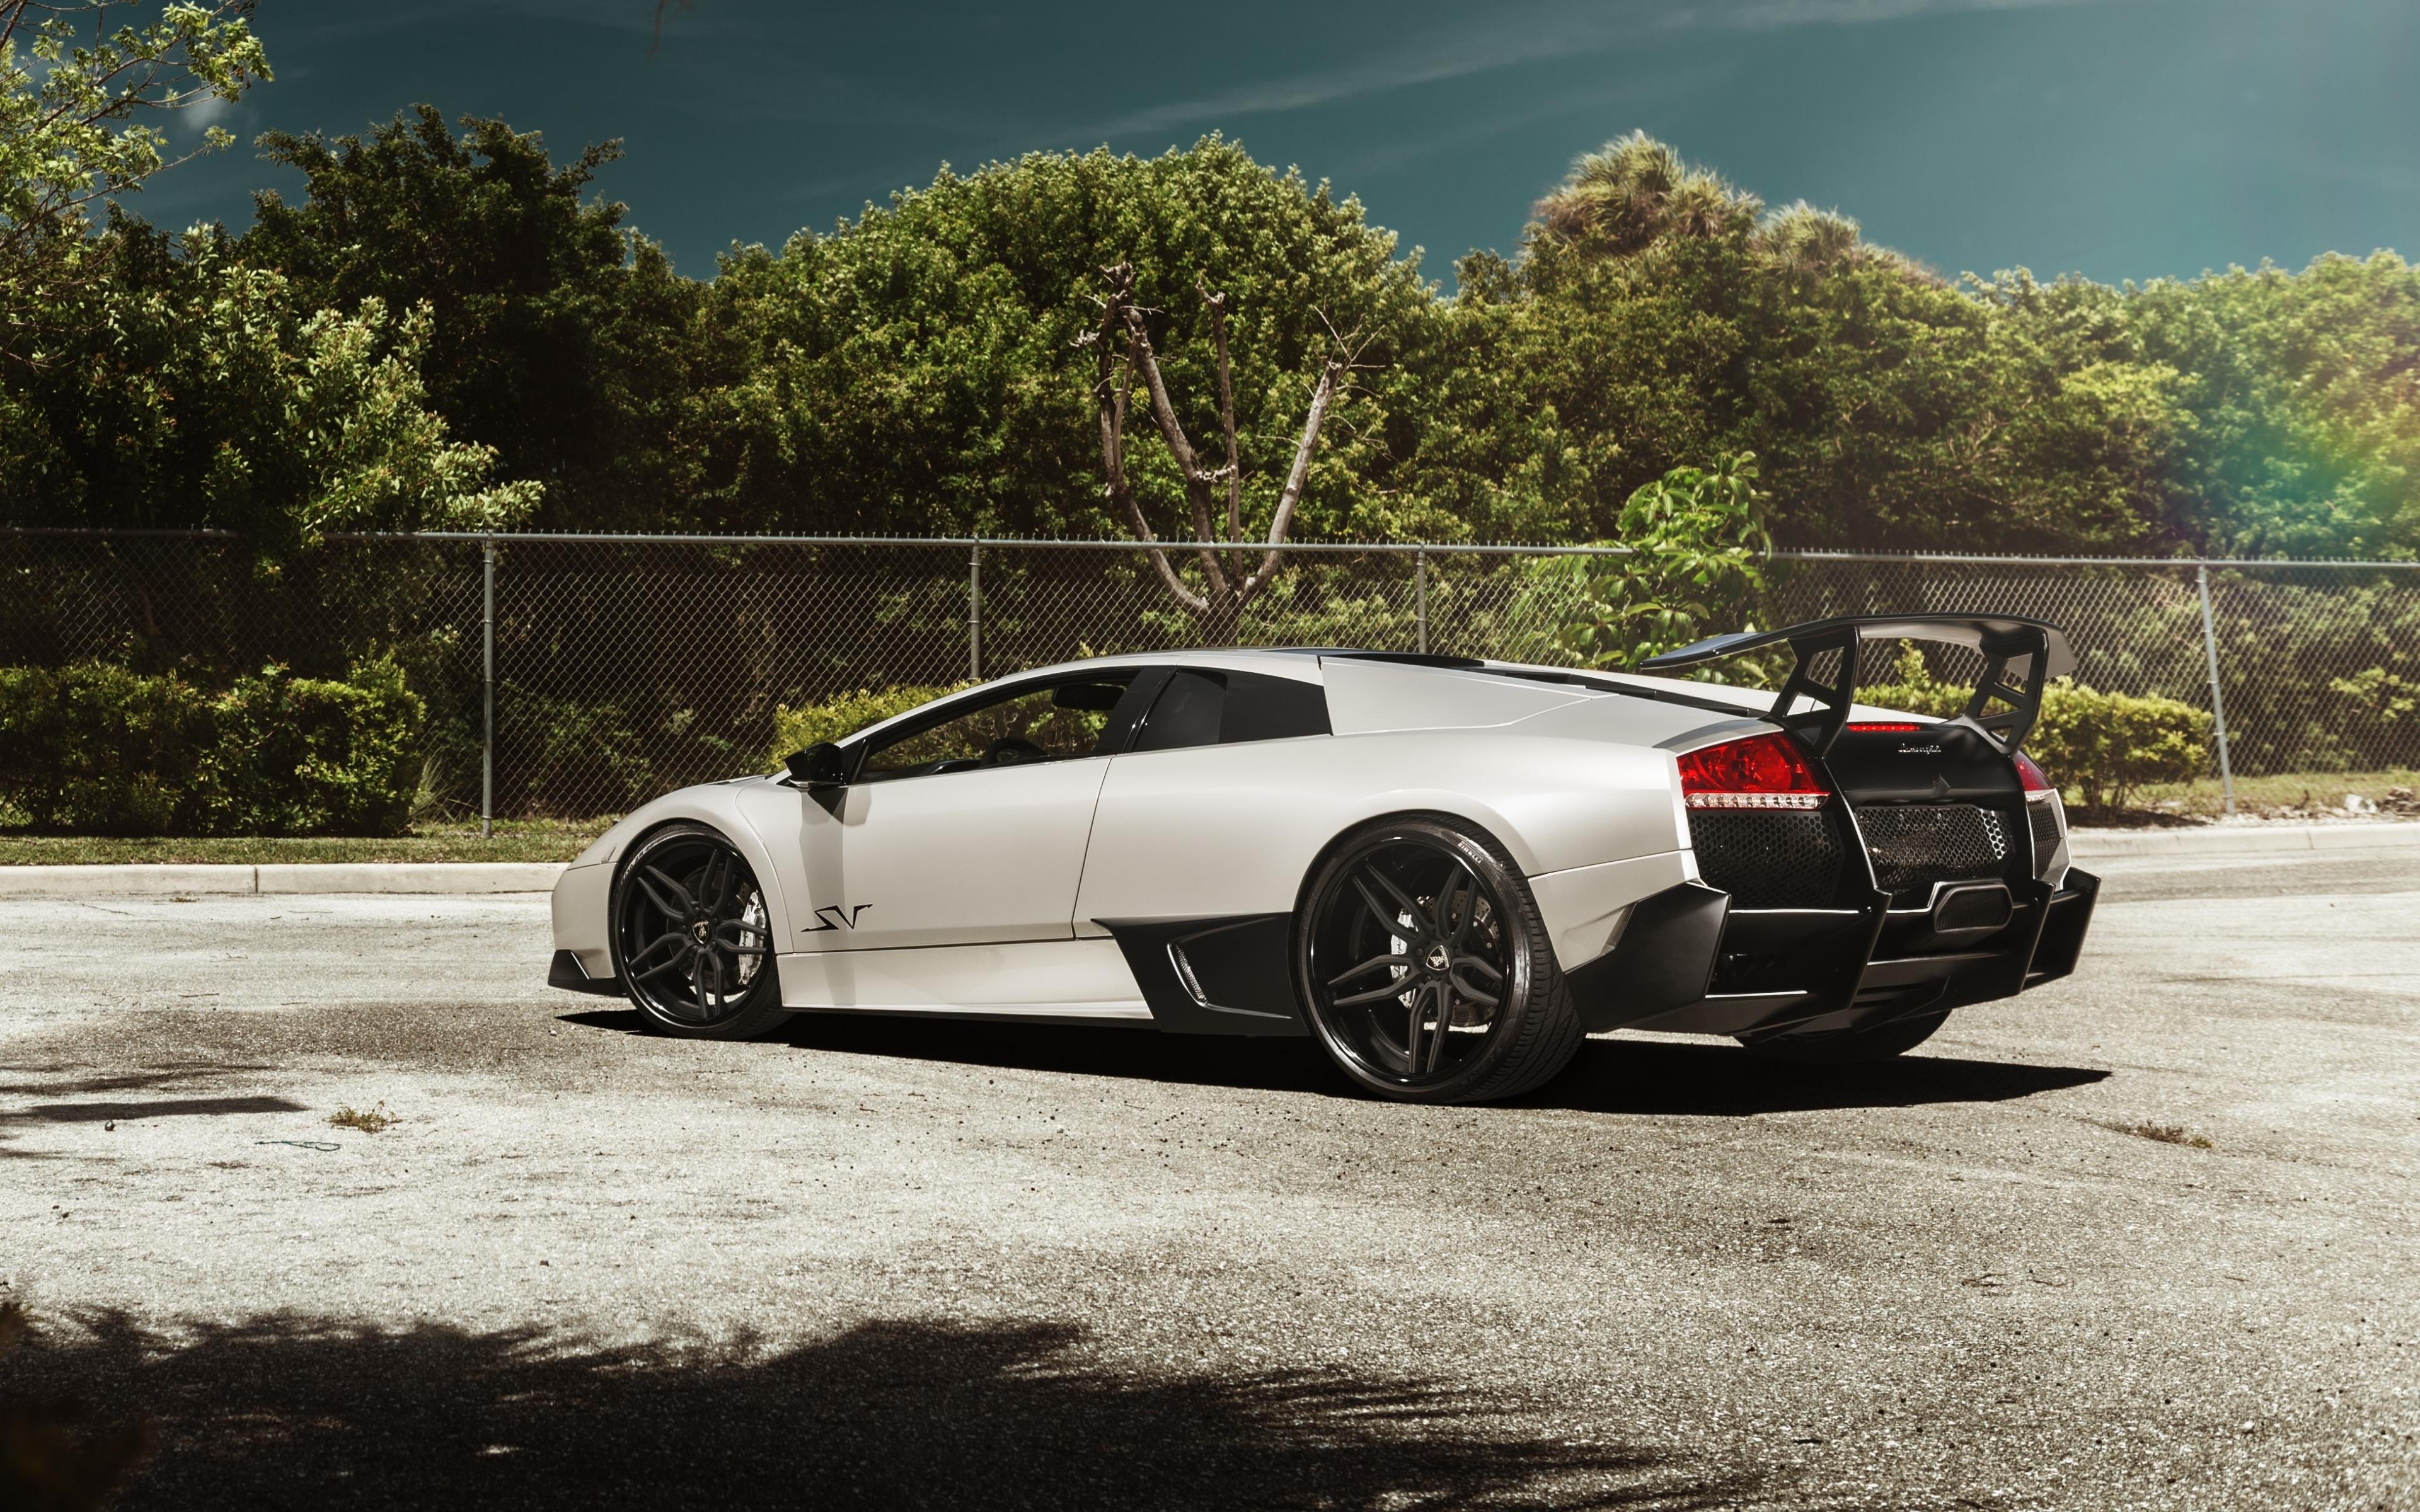 Download 3840x2400 Wallpaper Lamborghini Murcielago Rear Sports